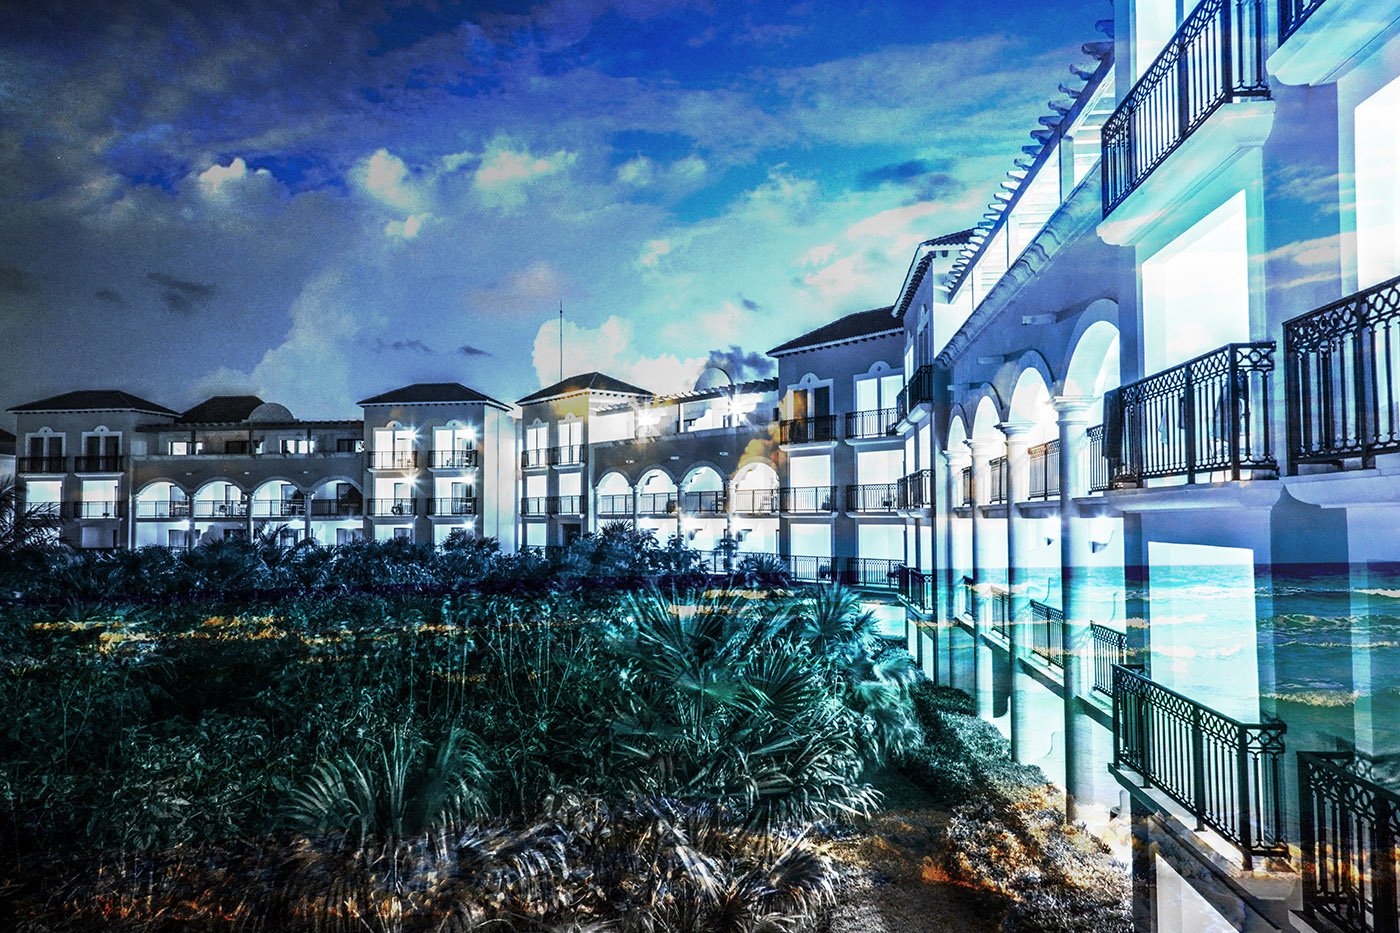 Hotel Resort Photo Montage 03 - RF Stock Image